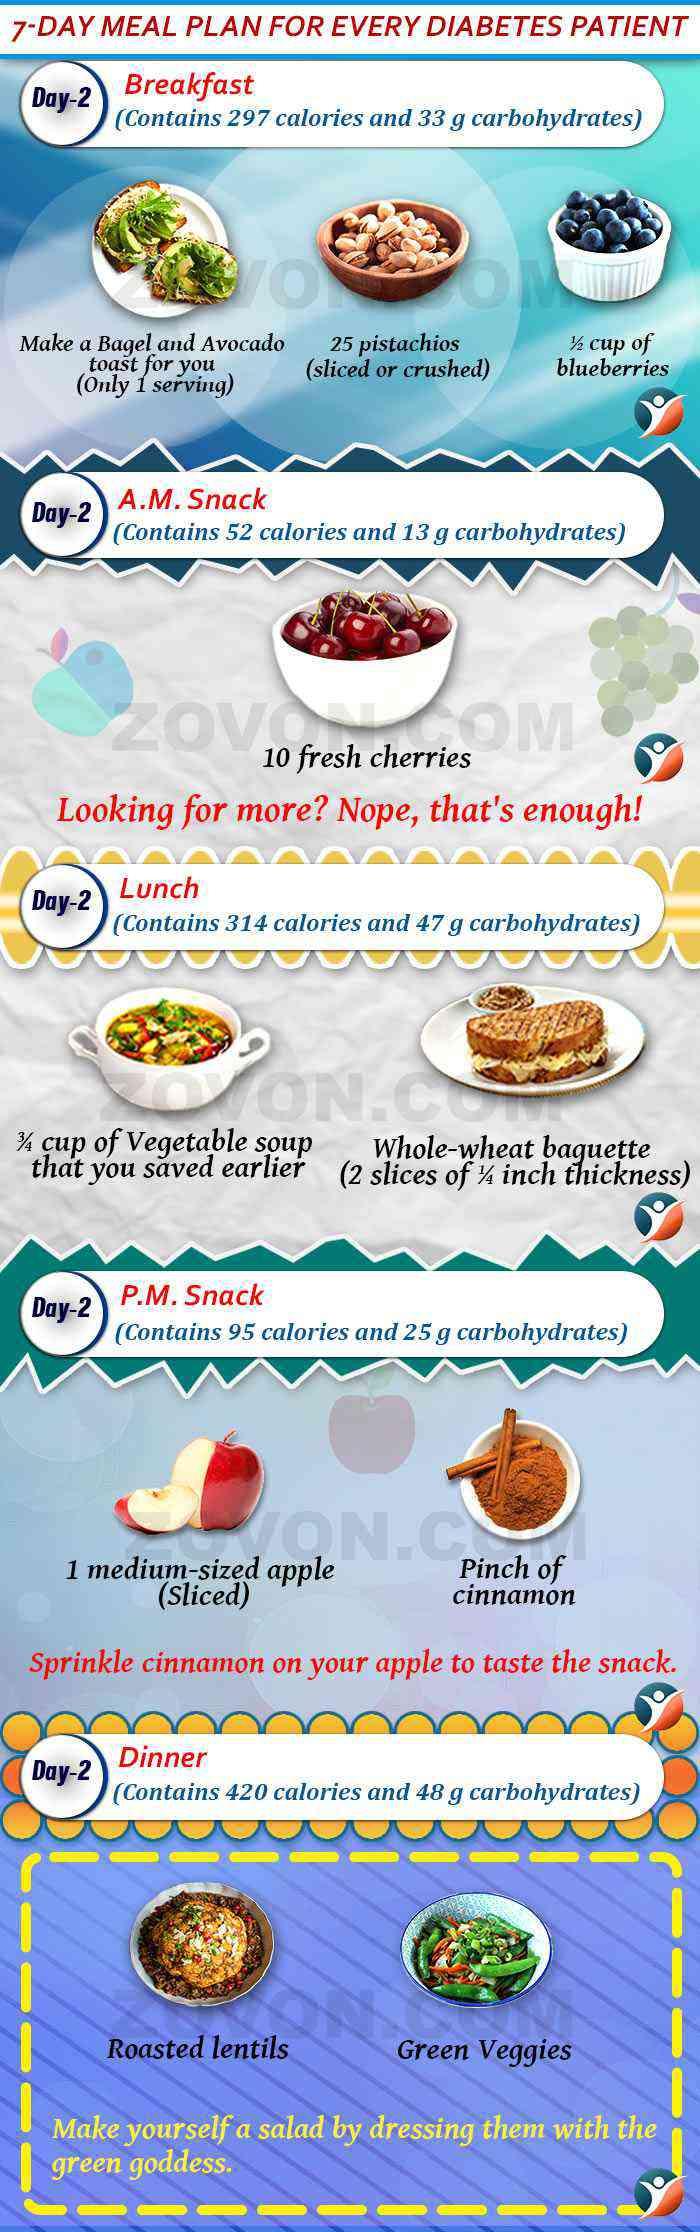 diabetes diet plan day 2